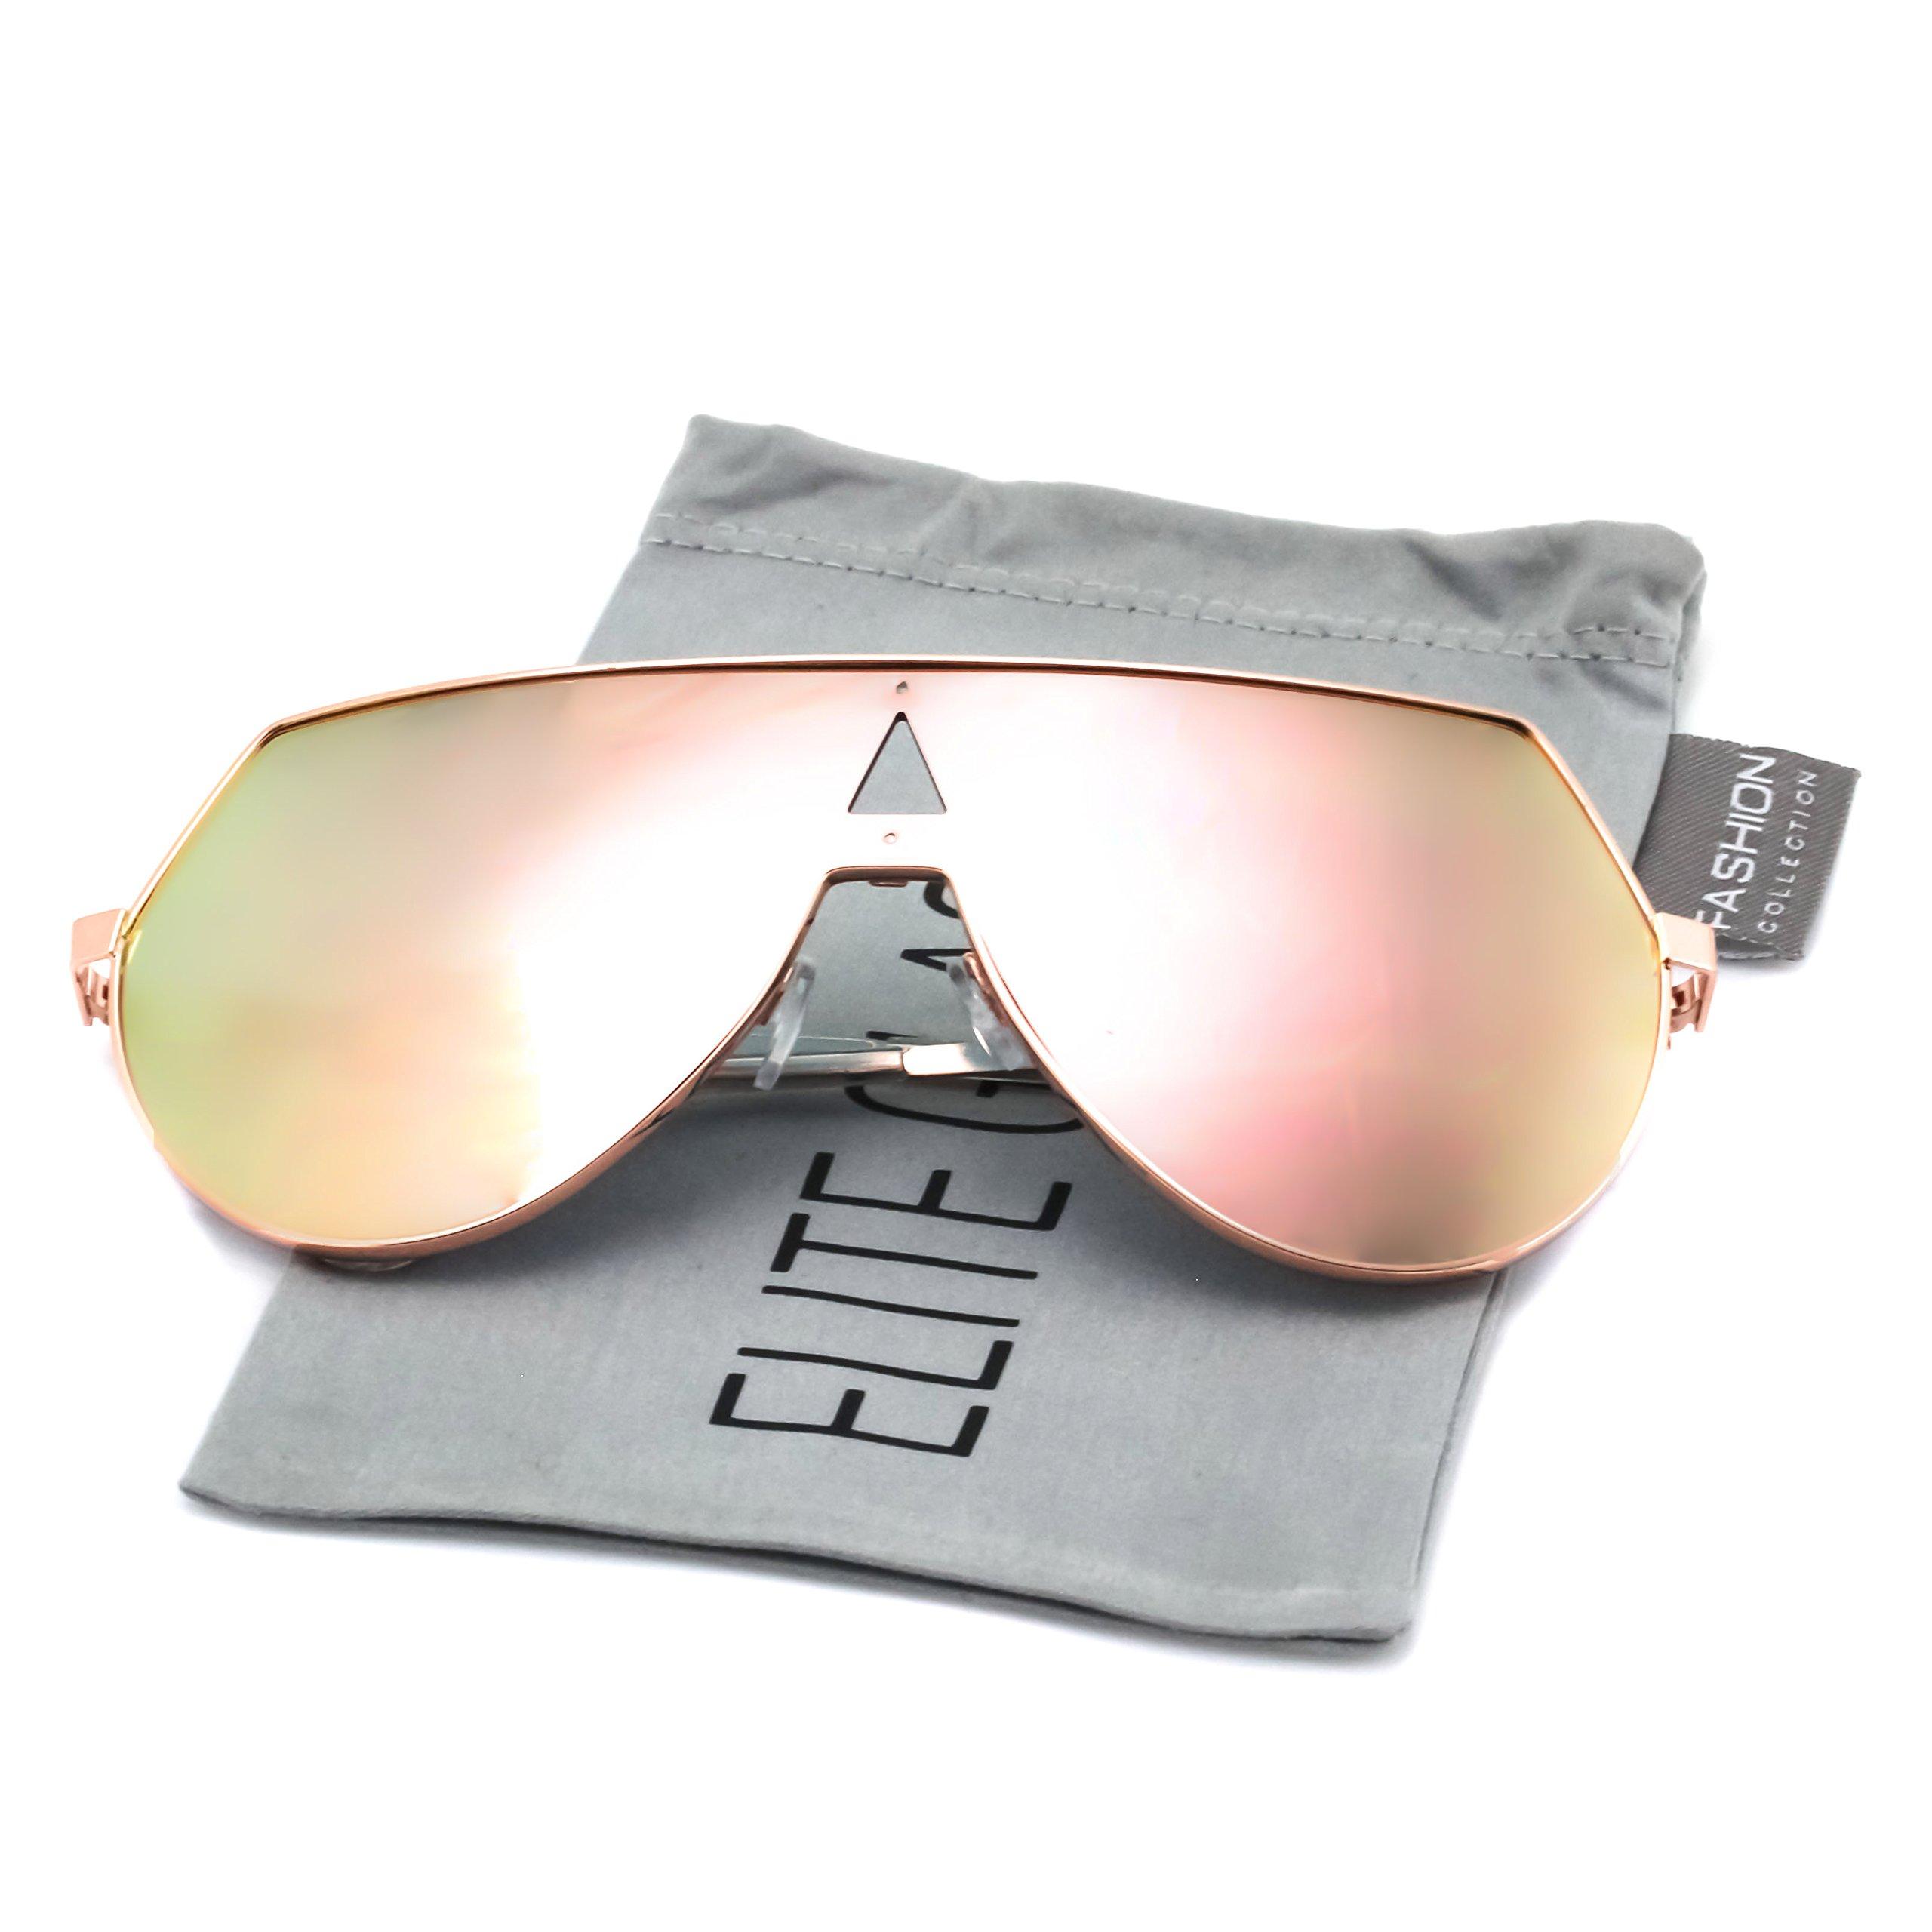 Elite Oversize Unisex Flat Top Aviator Retro Shield Mirrored Lens Rimless Sunglasses (Rose Pink Mirror, 5.8)